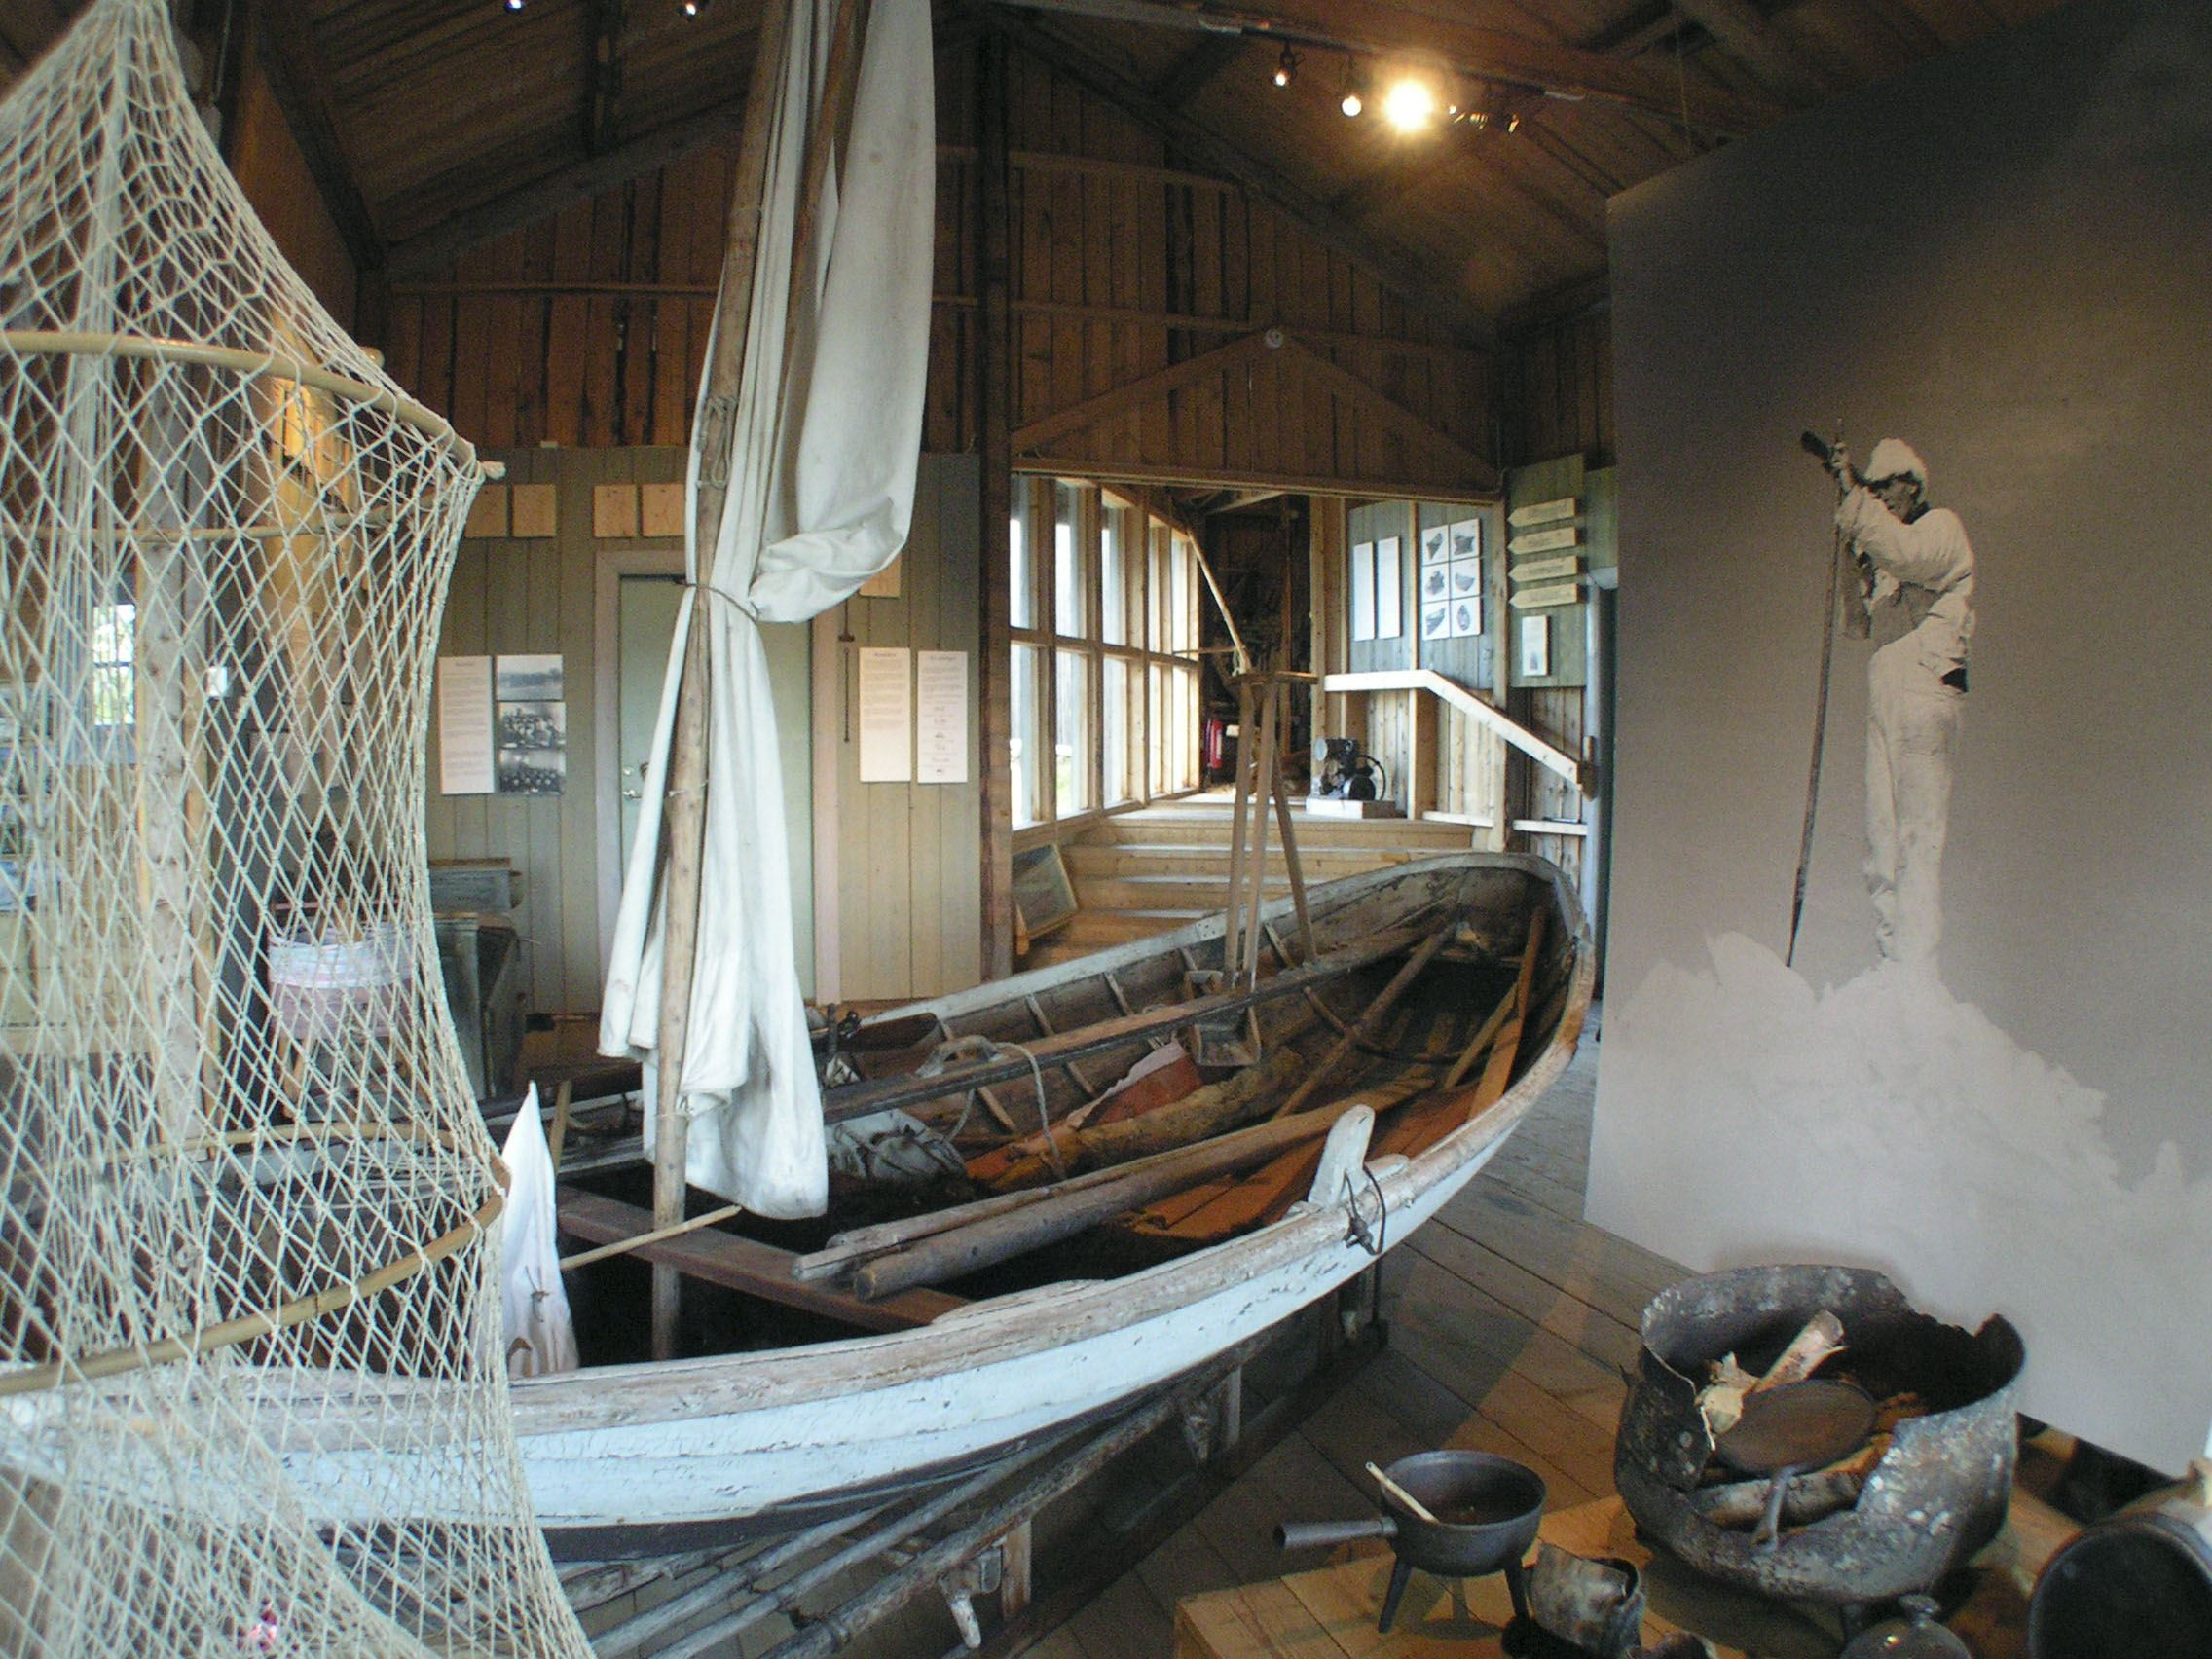 Holmöns boat museum